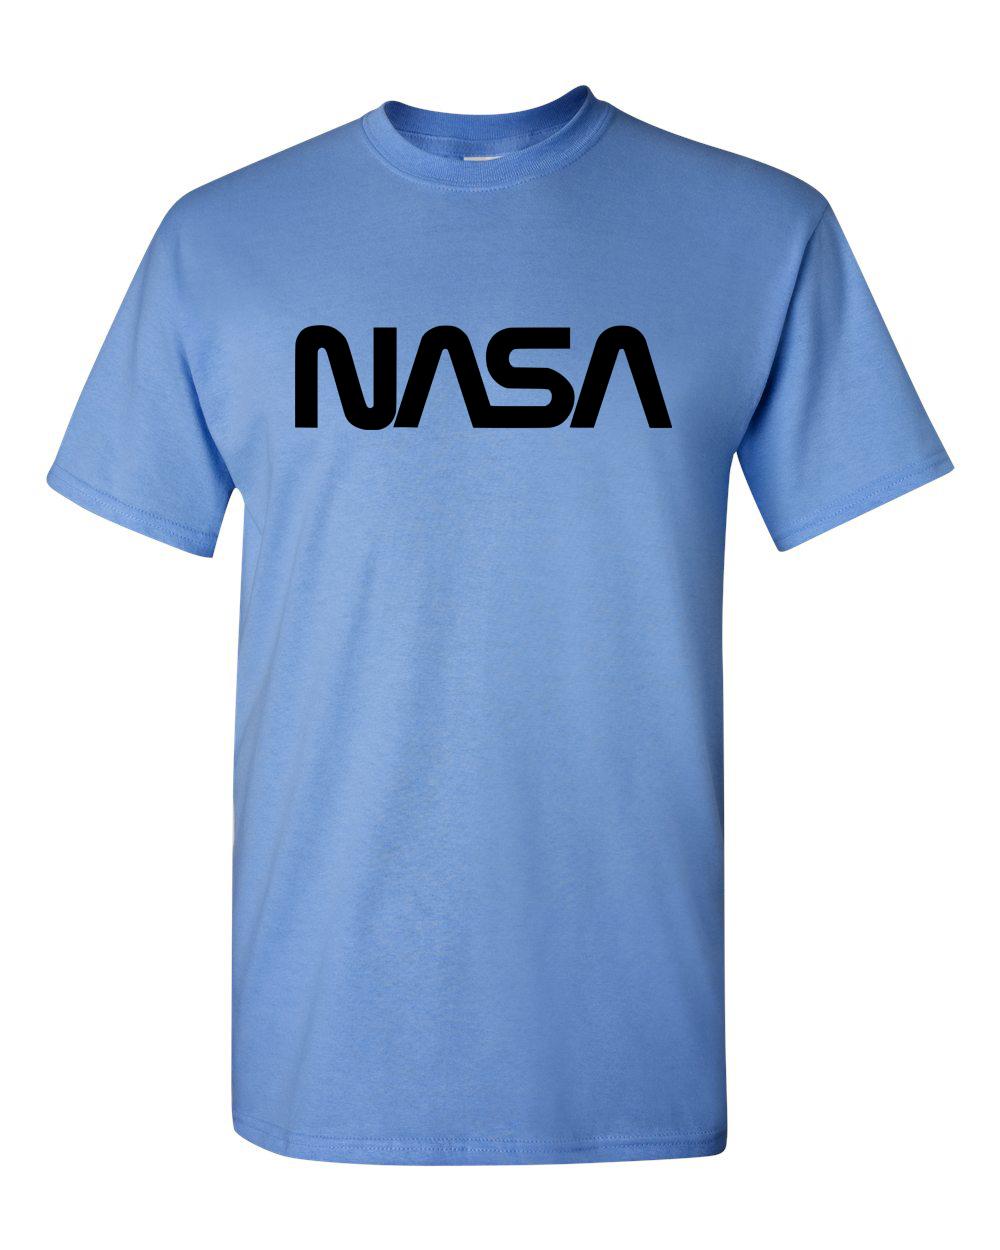 NASA Shirts Sale - Pics about space